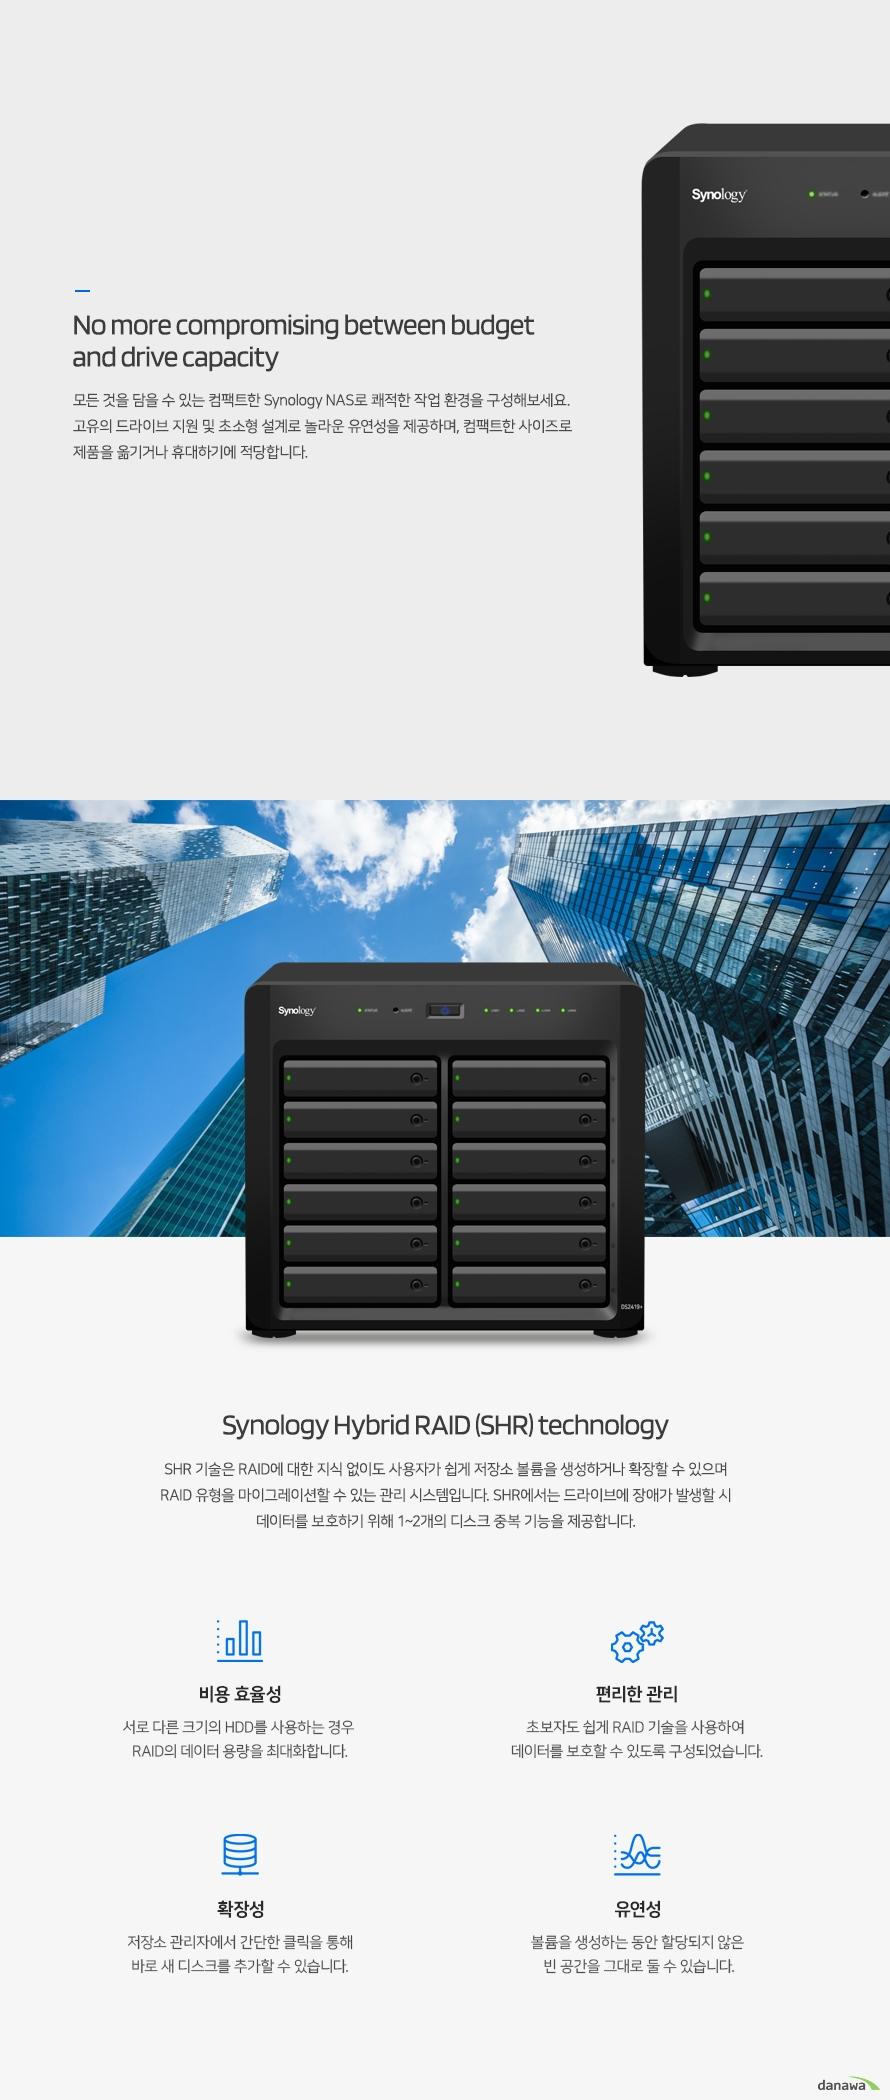 Synology DS2419+ RAM 4GB (168TB)